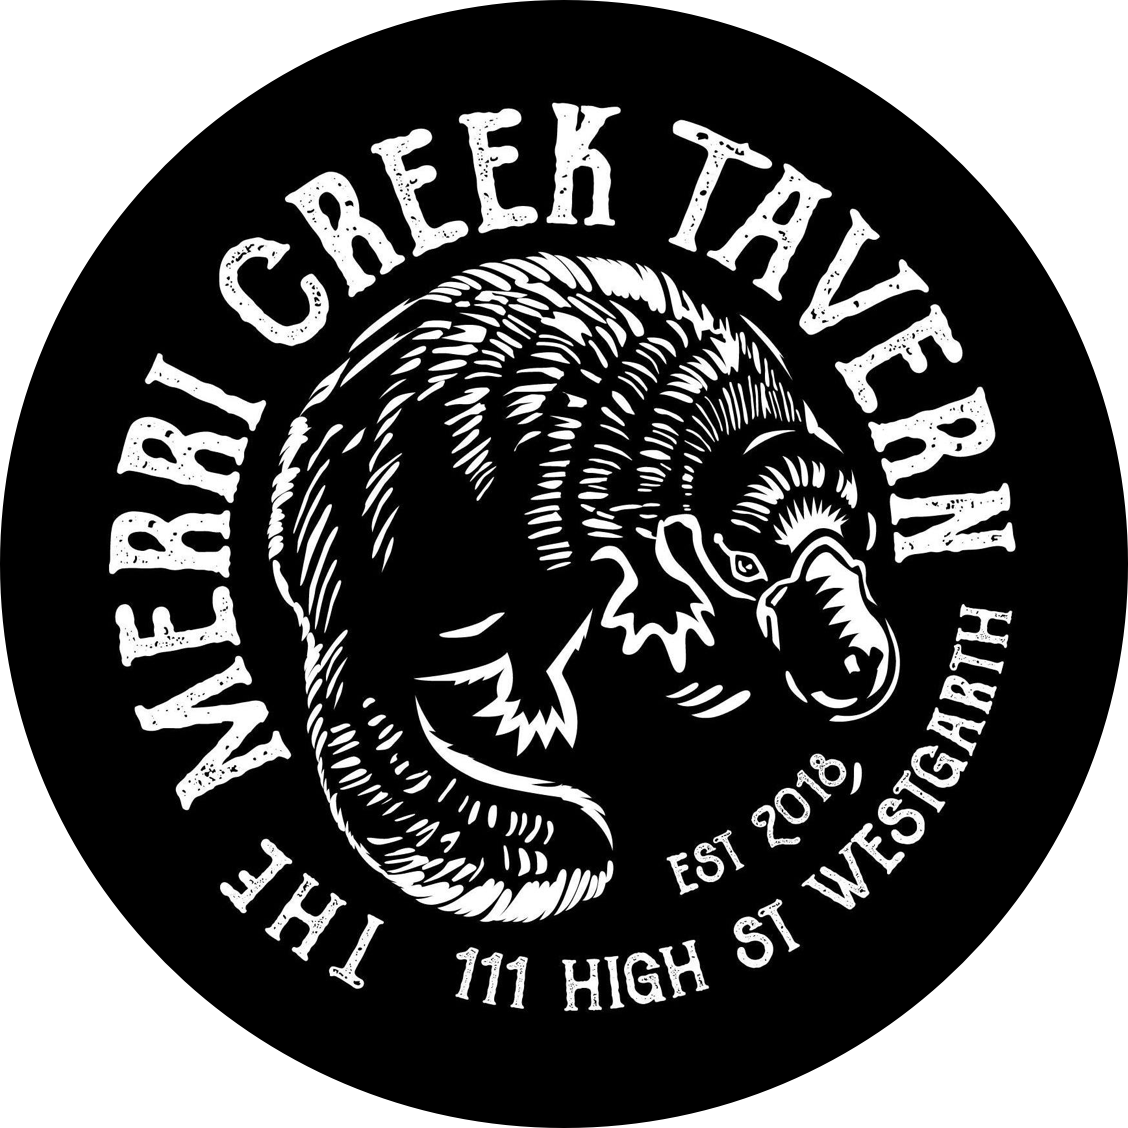 Merri Creek Tavern